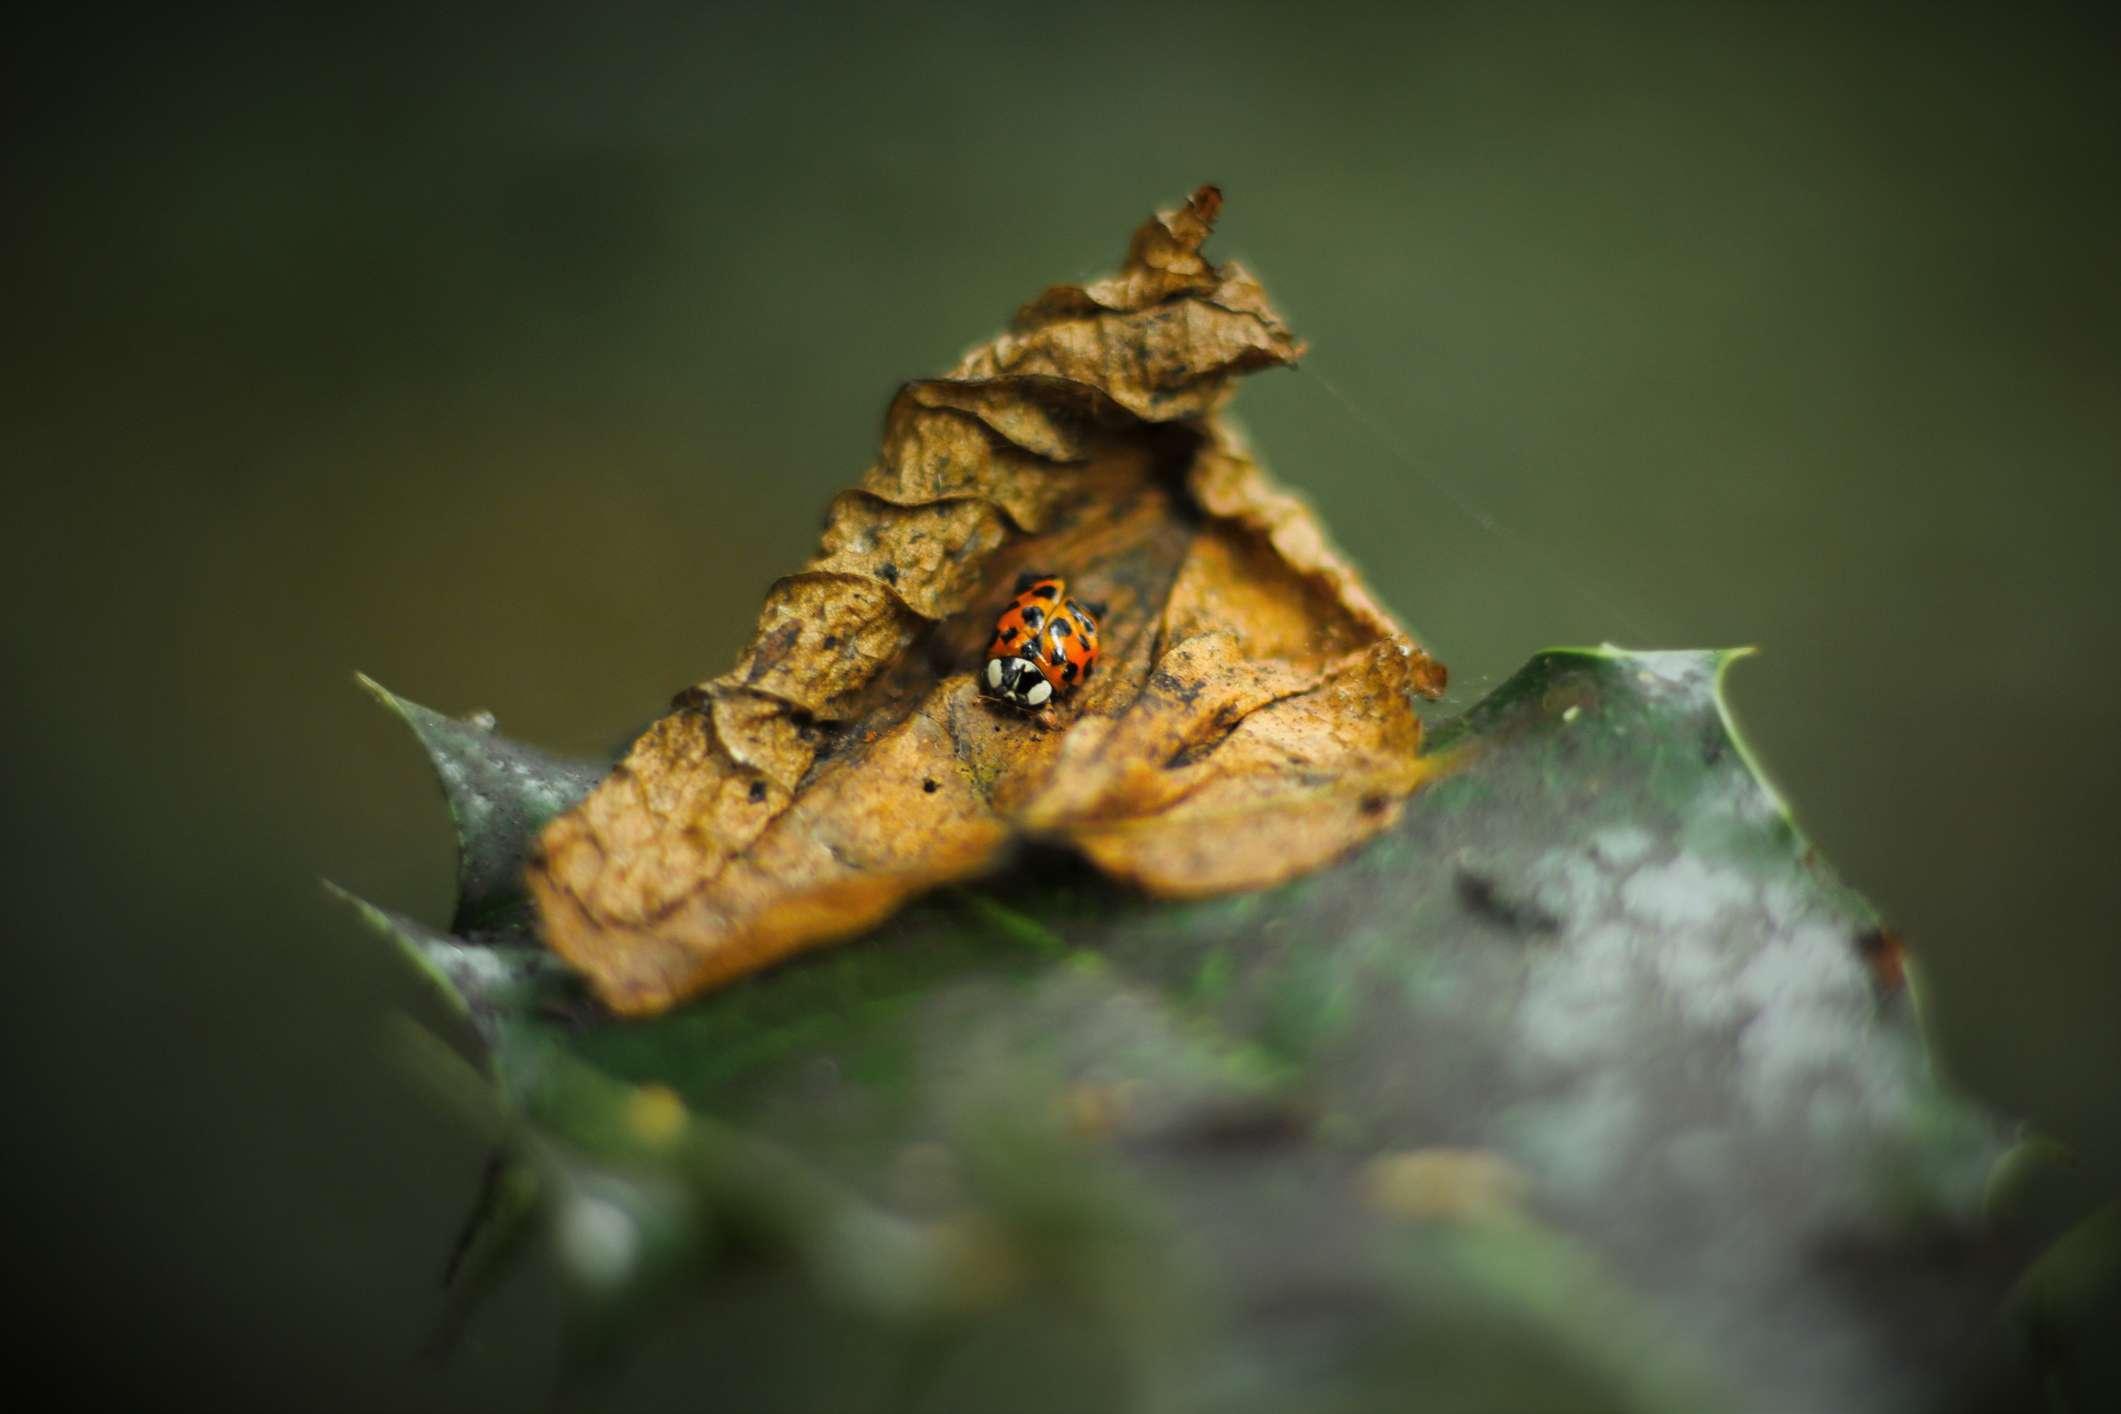 A ladybug on a dry shrivelled brown leaf.